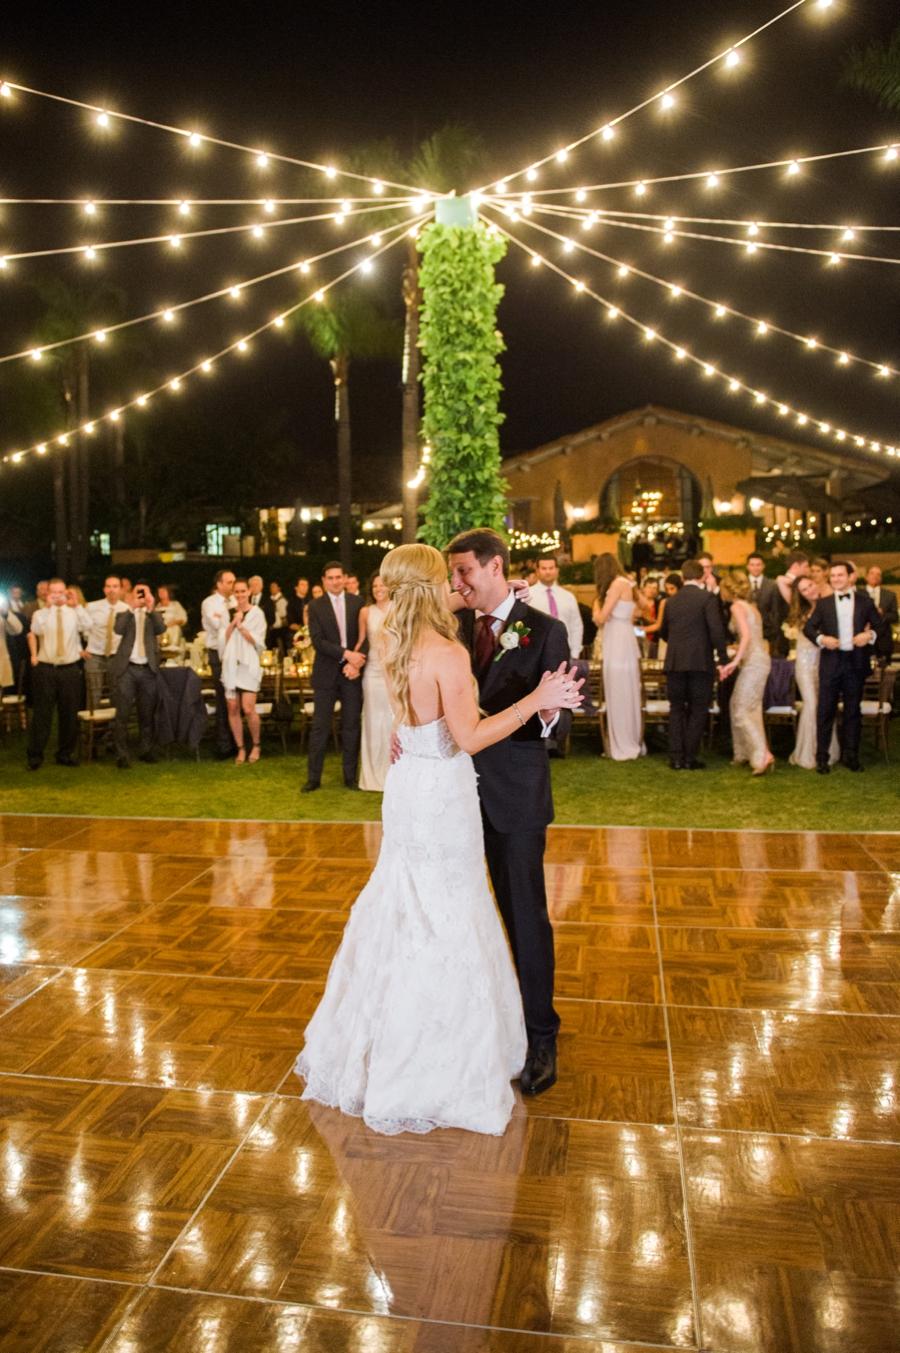 Rancho_Valencia_Resort_and_Spa_San_Diego_SoCal_Wedding_029.jpg